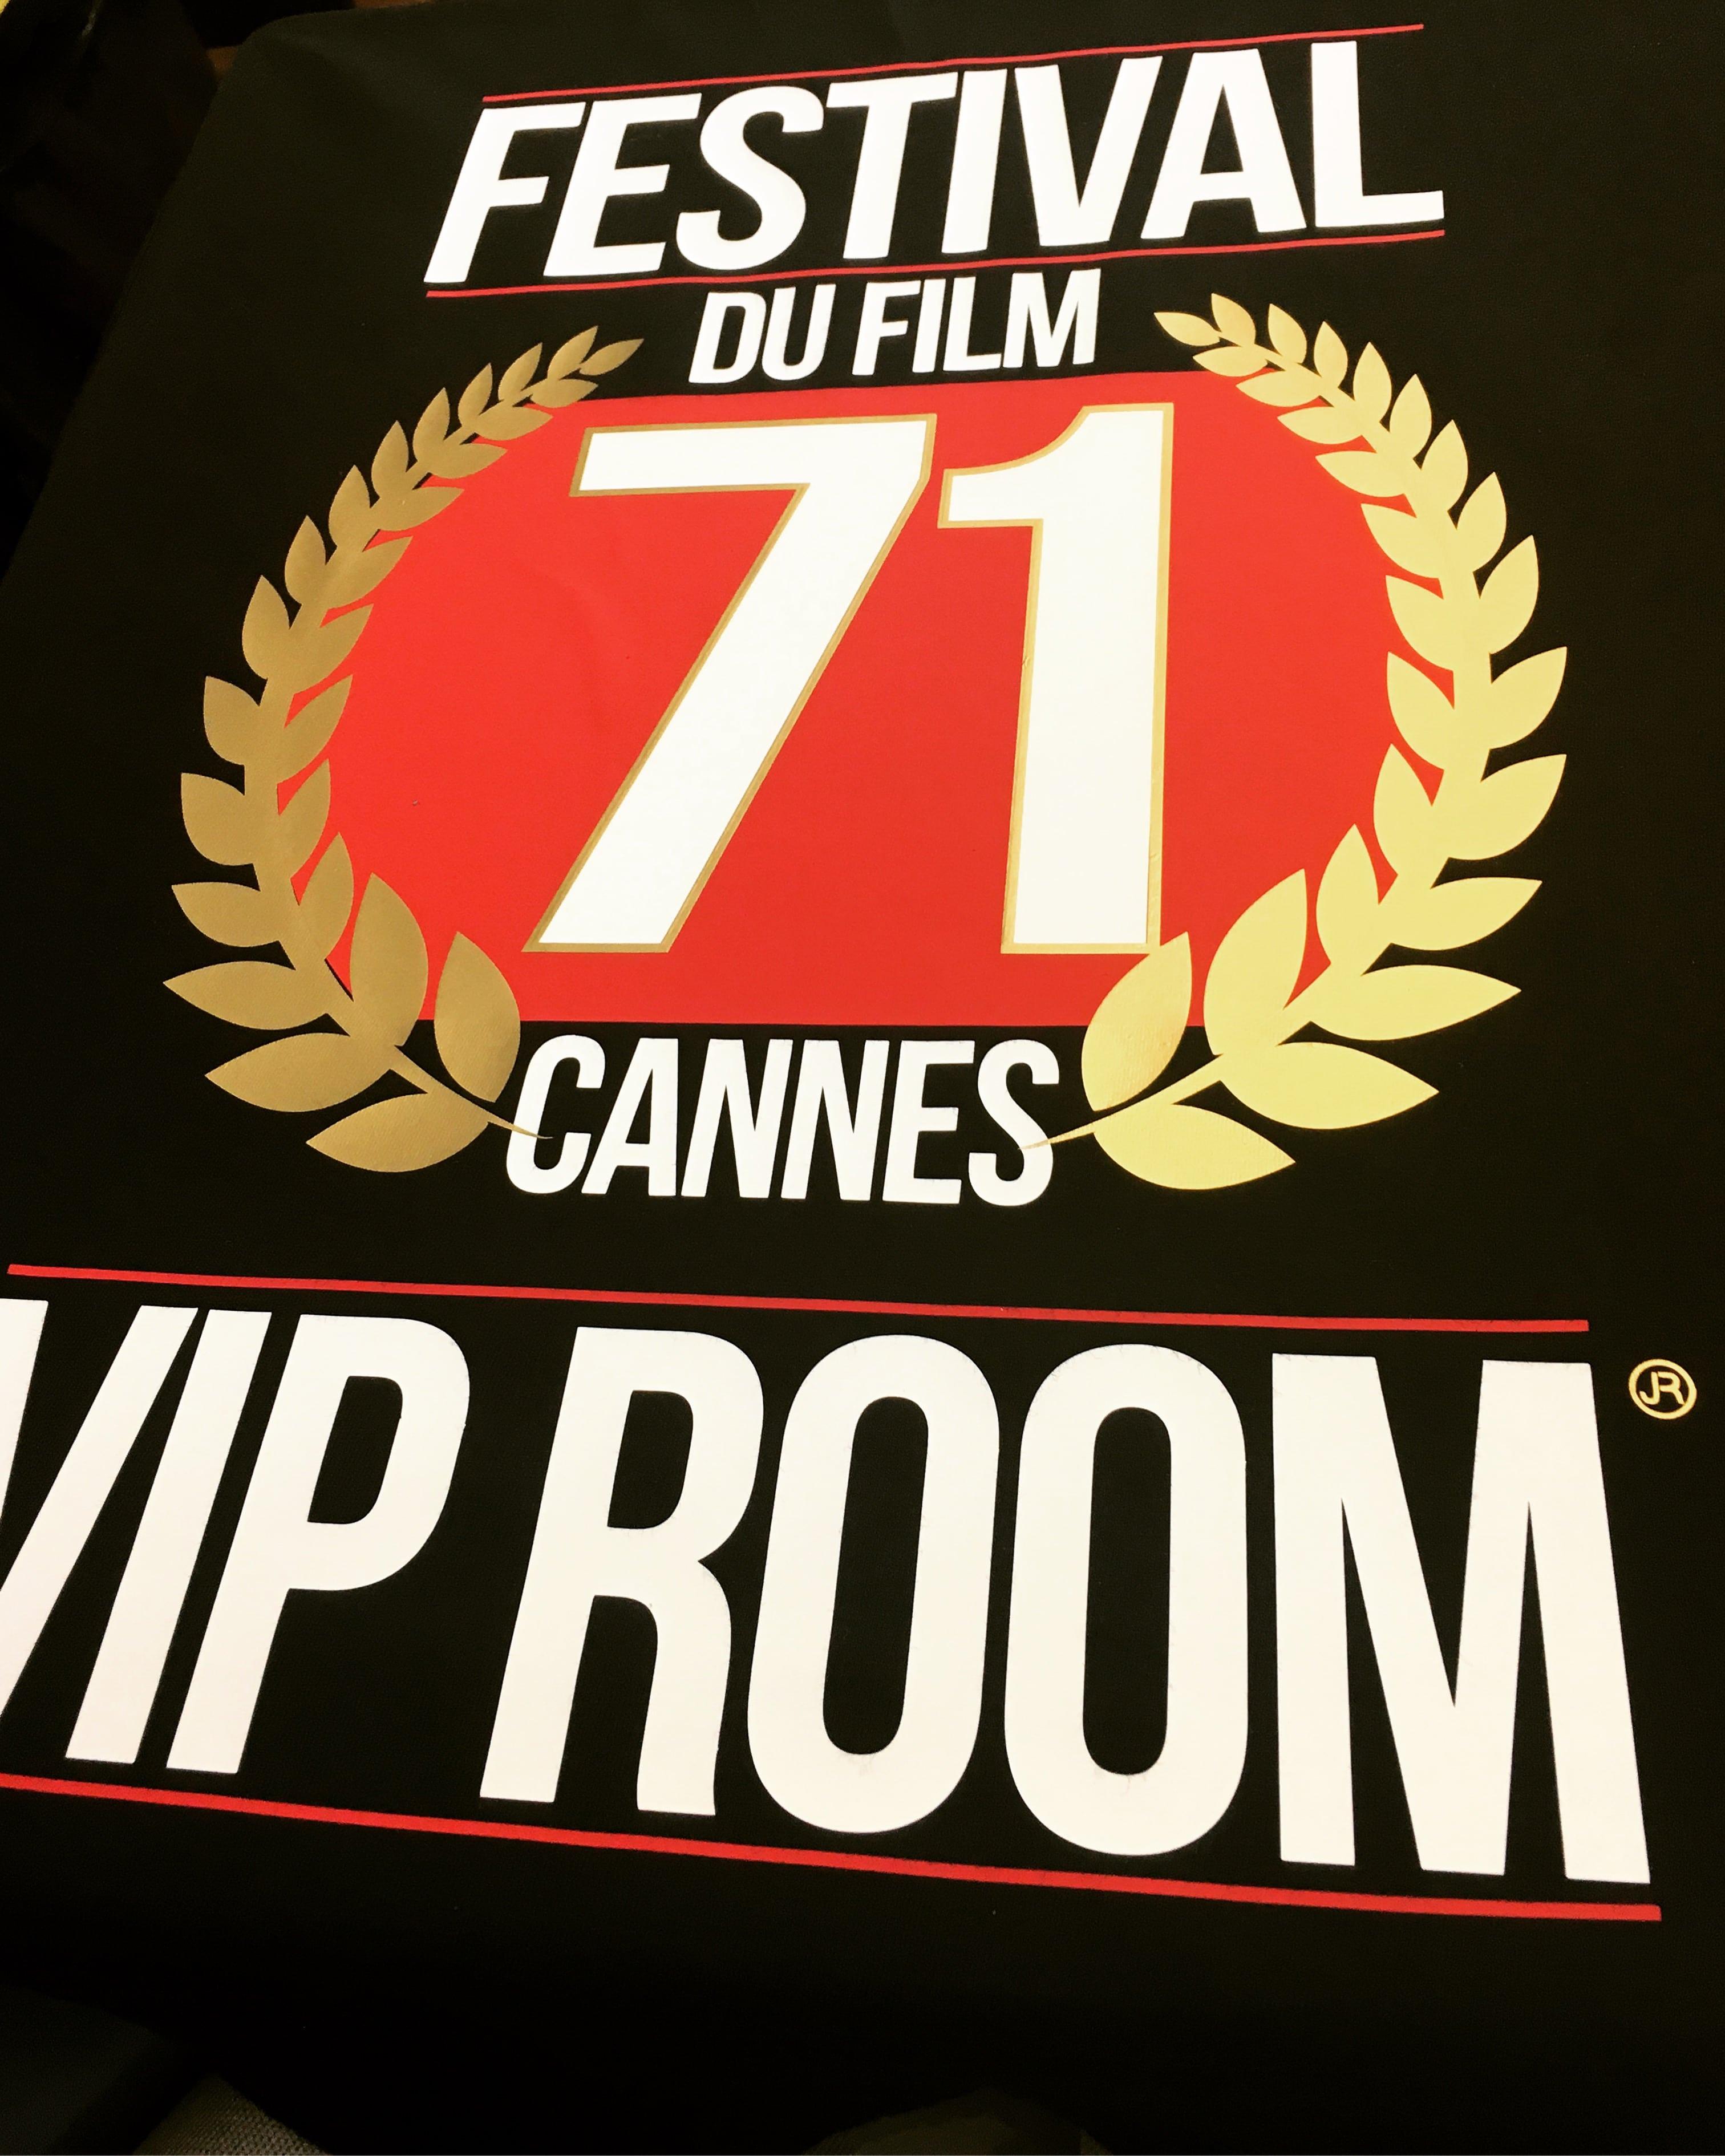 VIP ROOM FESTIVAL DE CANNES 2018